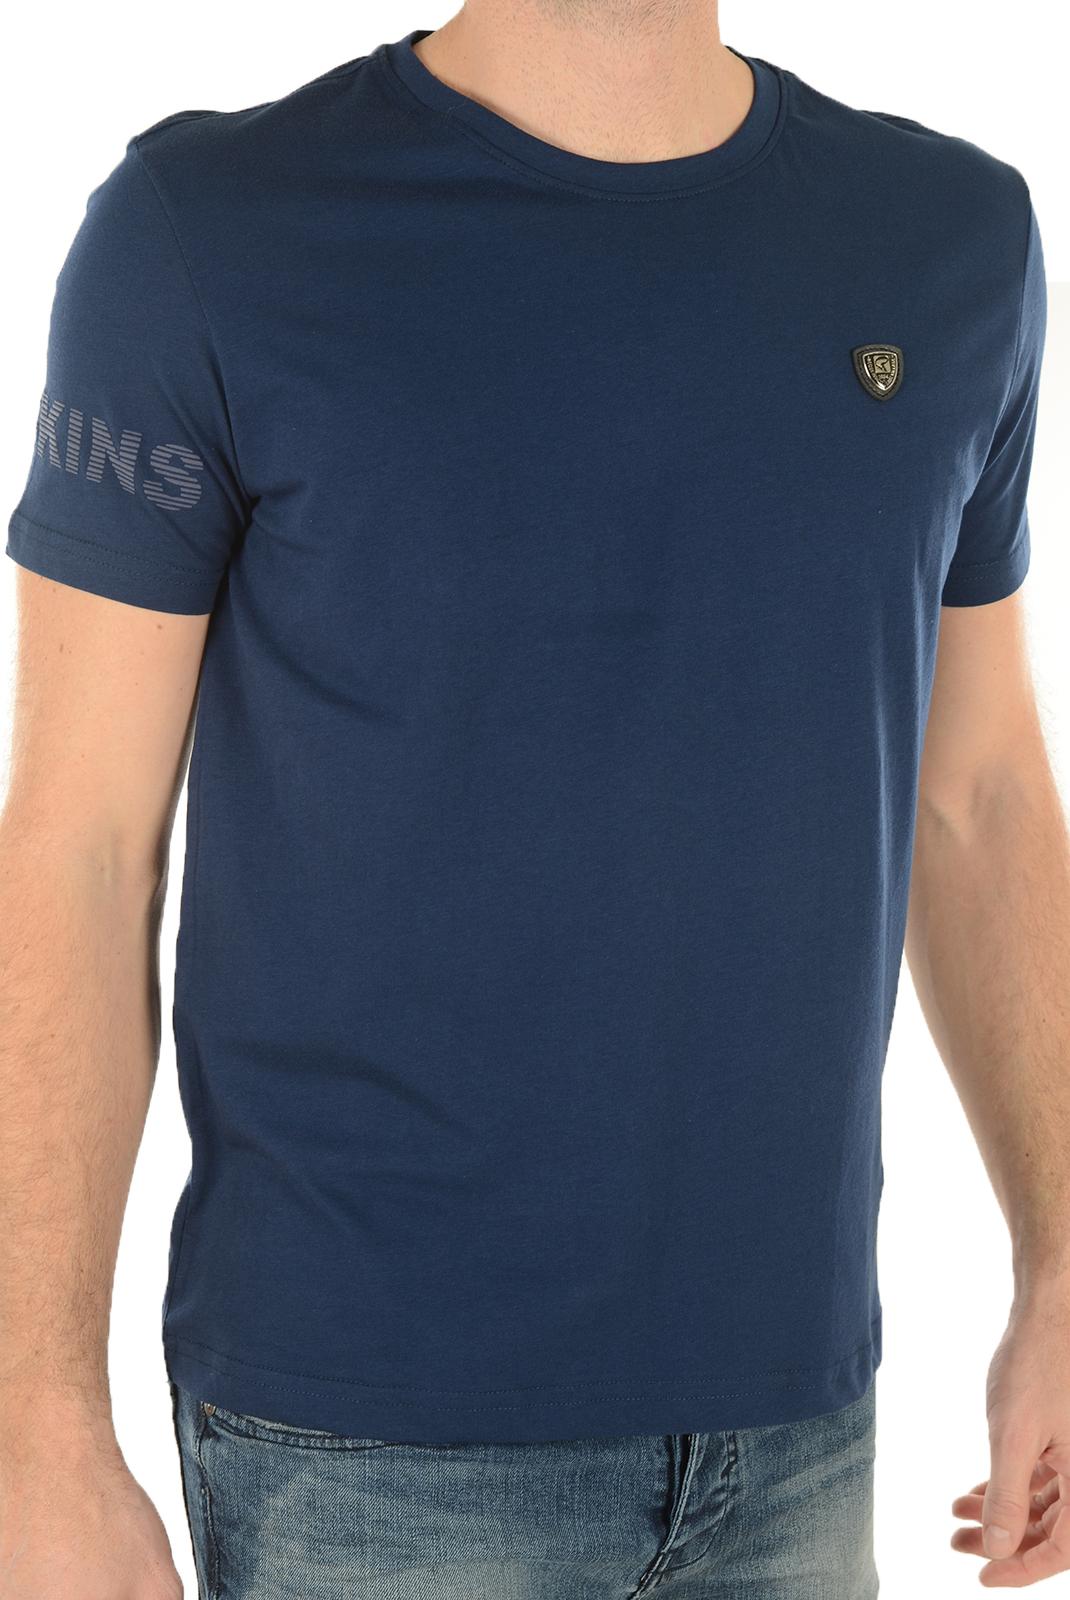 Tee-shirts manches courtes  Redskins THANOS WARNER P16 NAVY BLUE